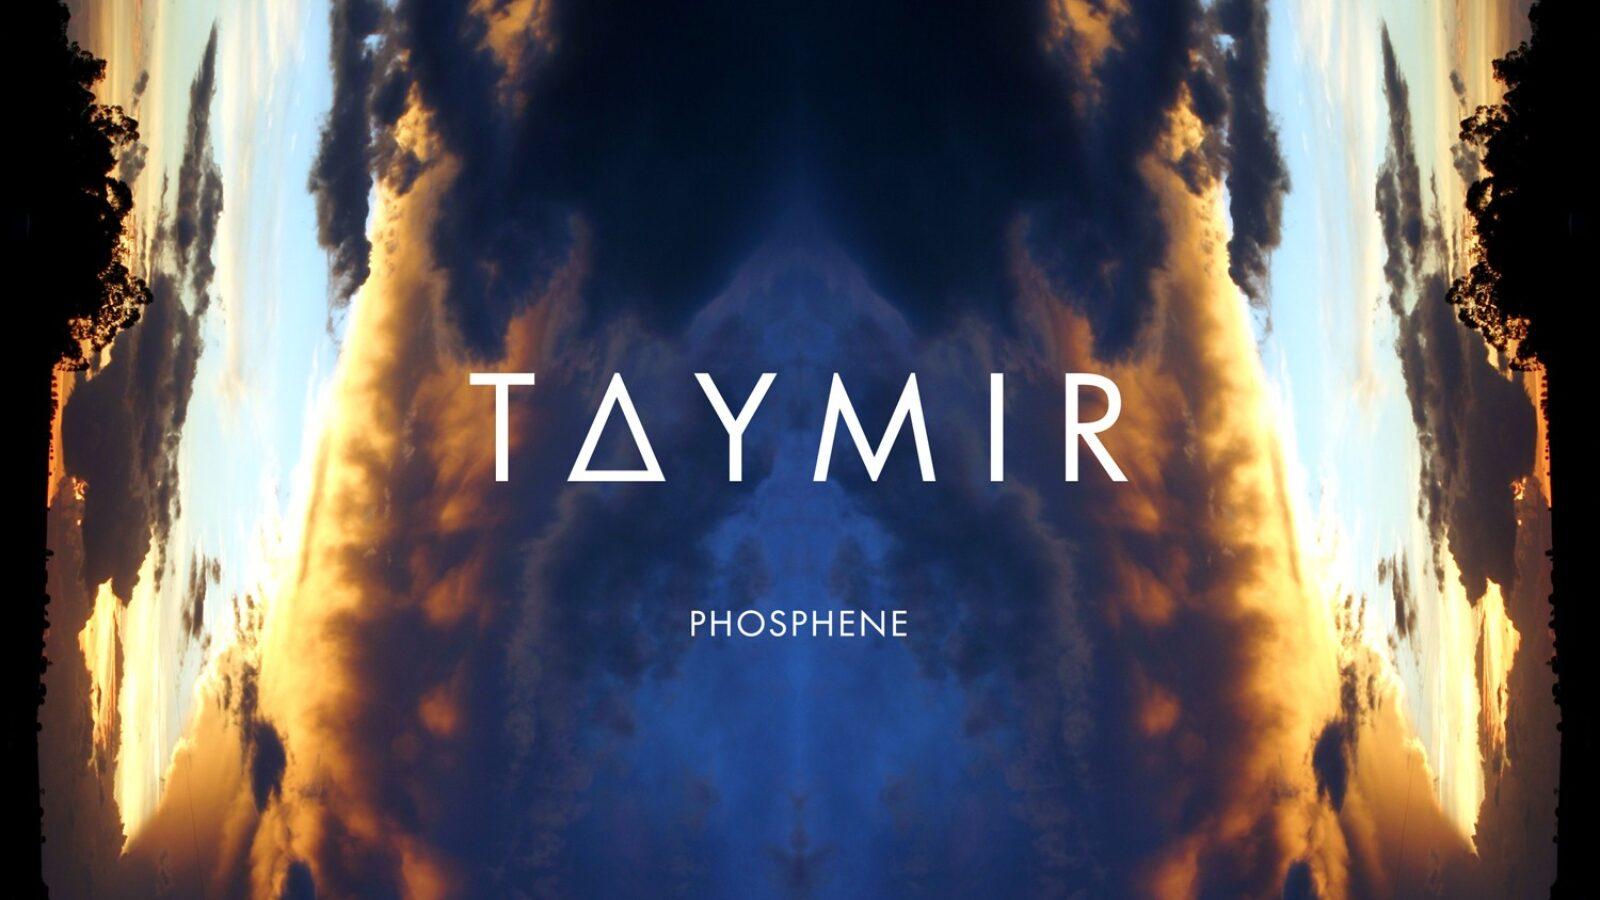 TAYMIR Phosphene